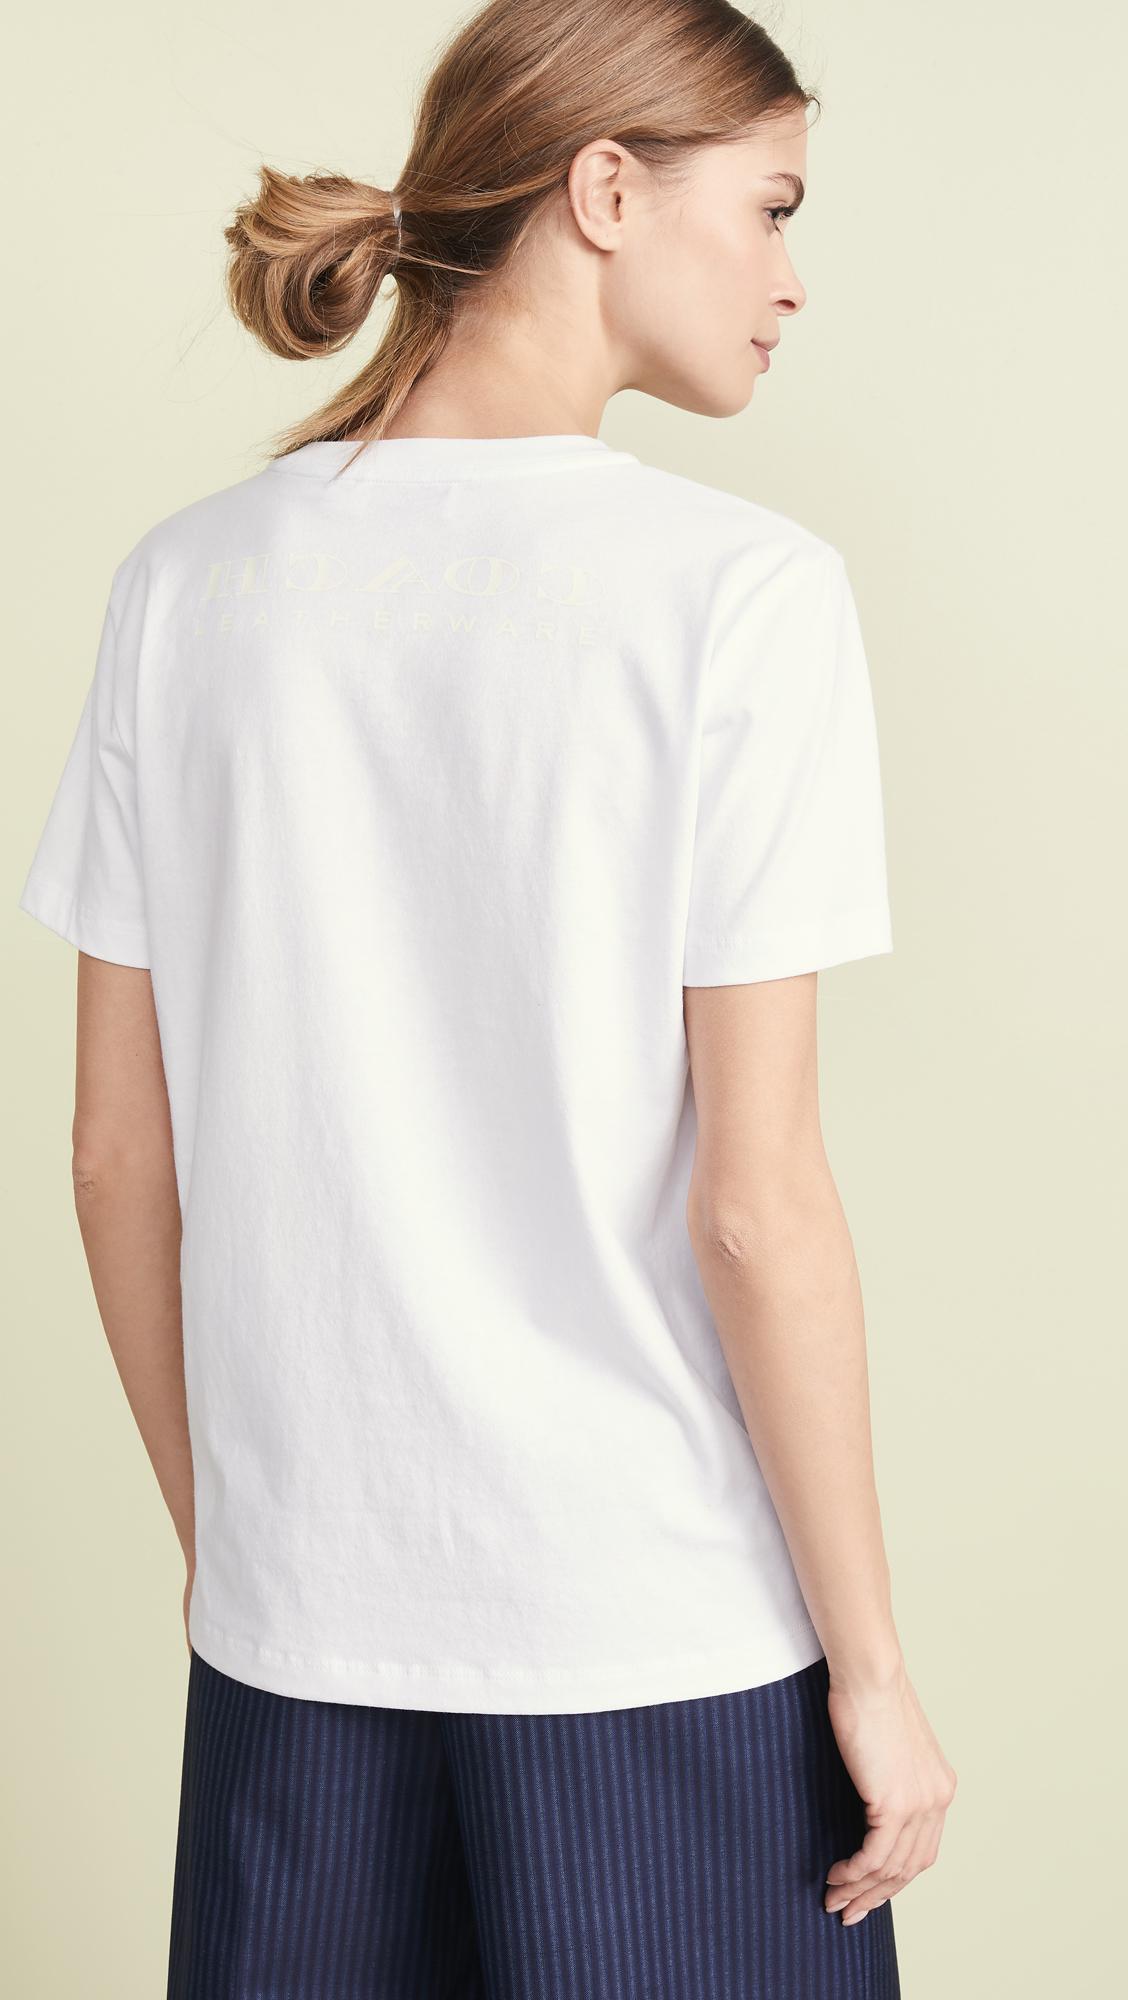 ba7a81e7ac91b COACH Disney X Dumbo Signature T-shirt in White - Lyst